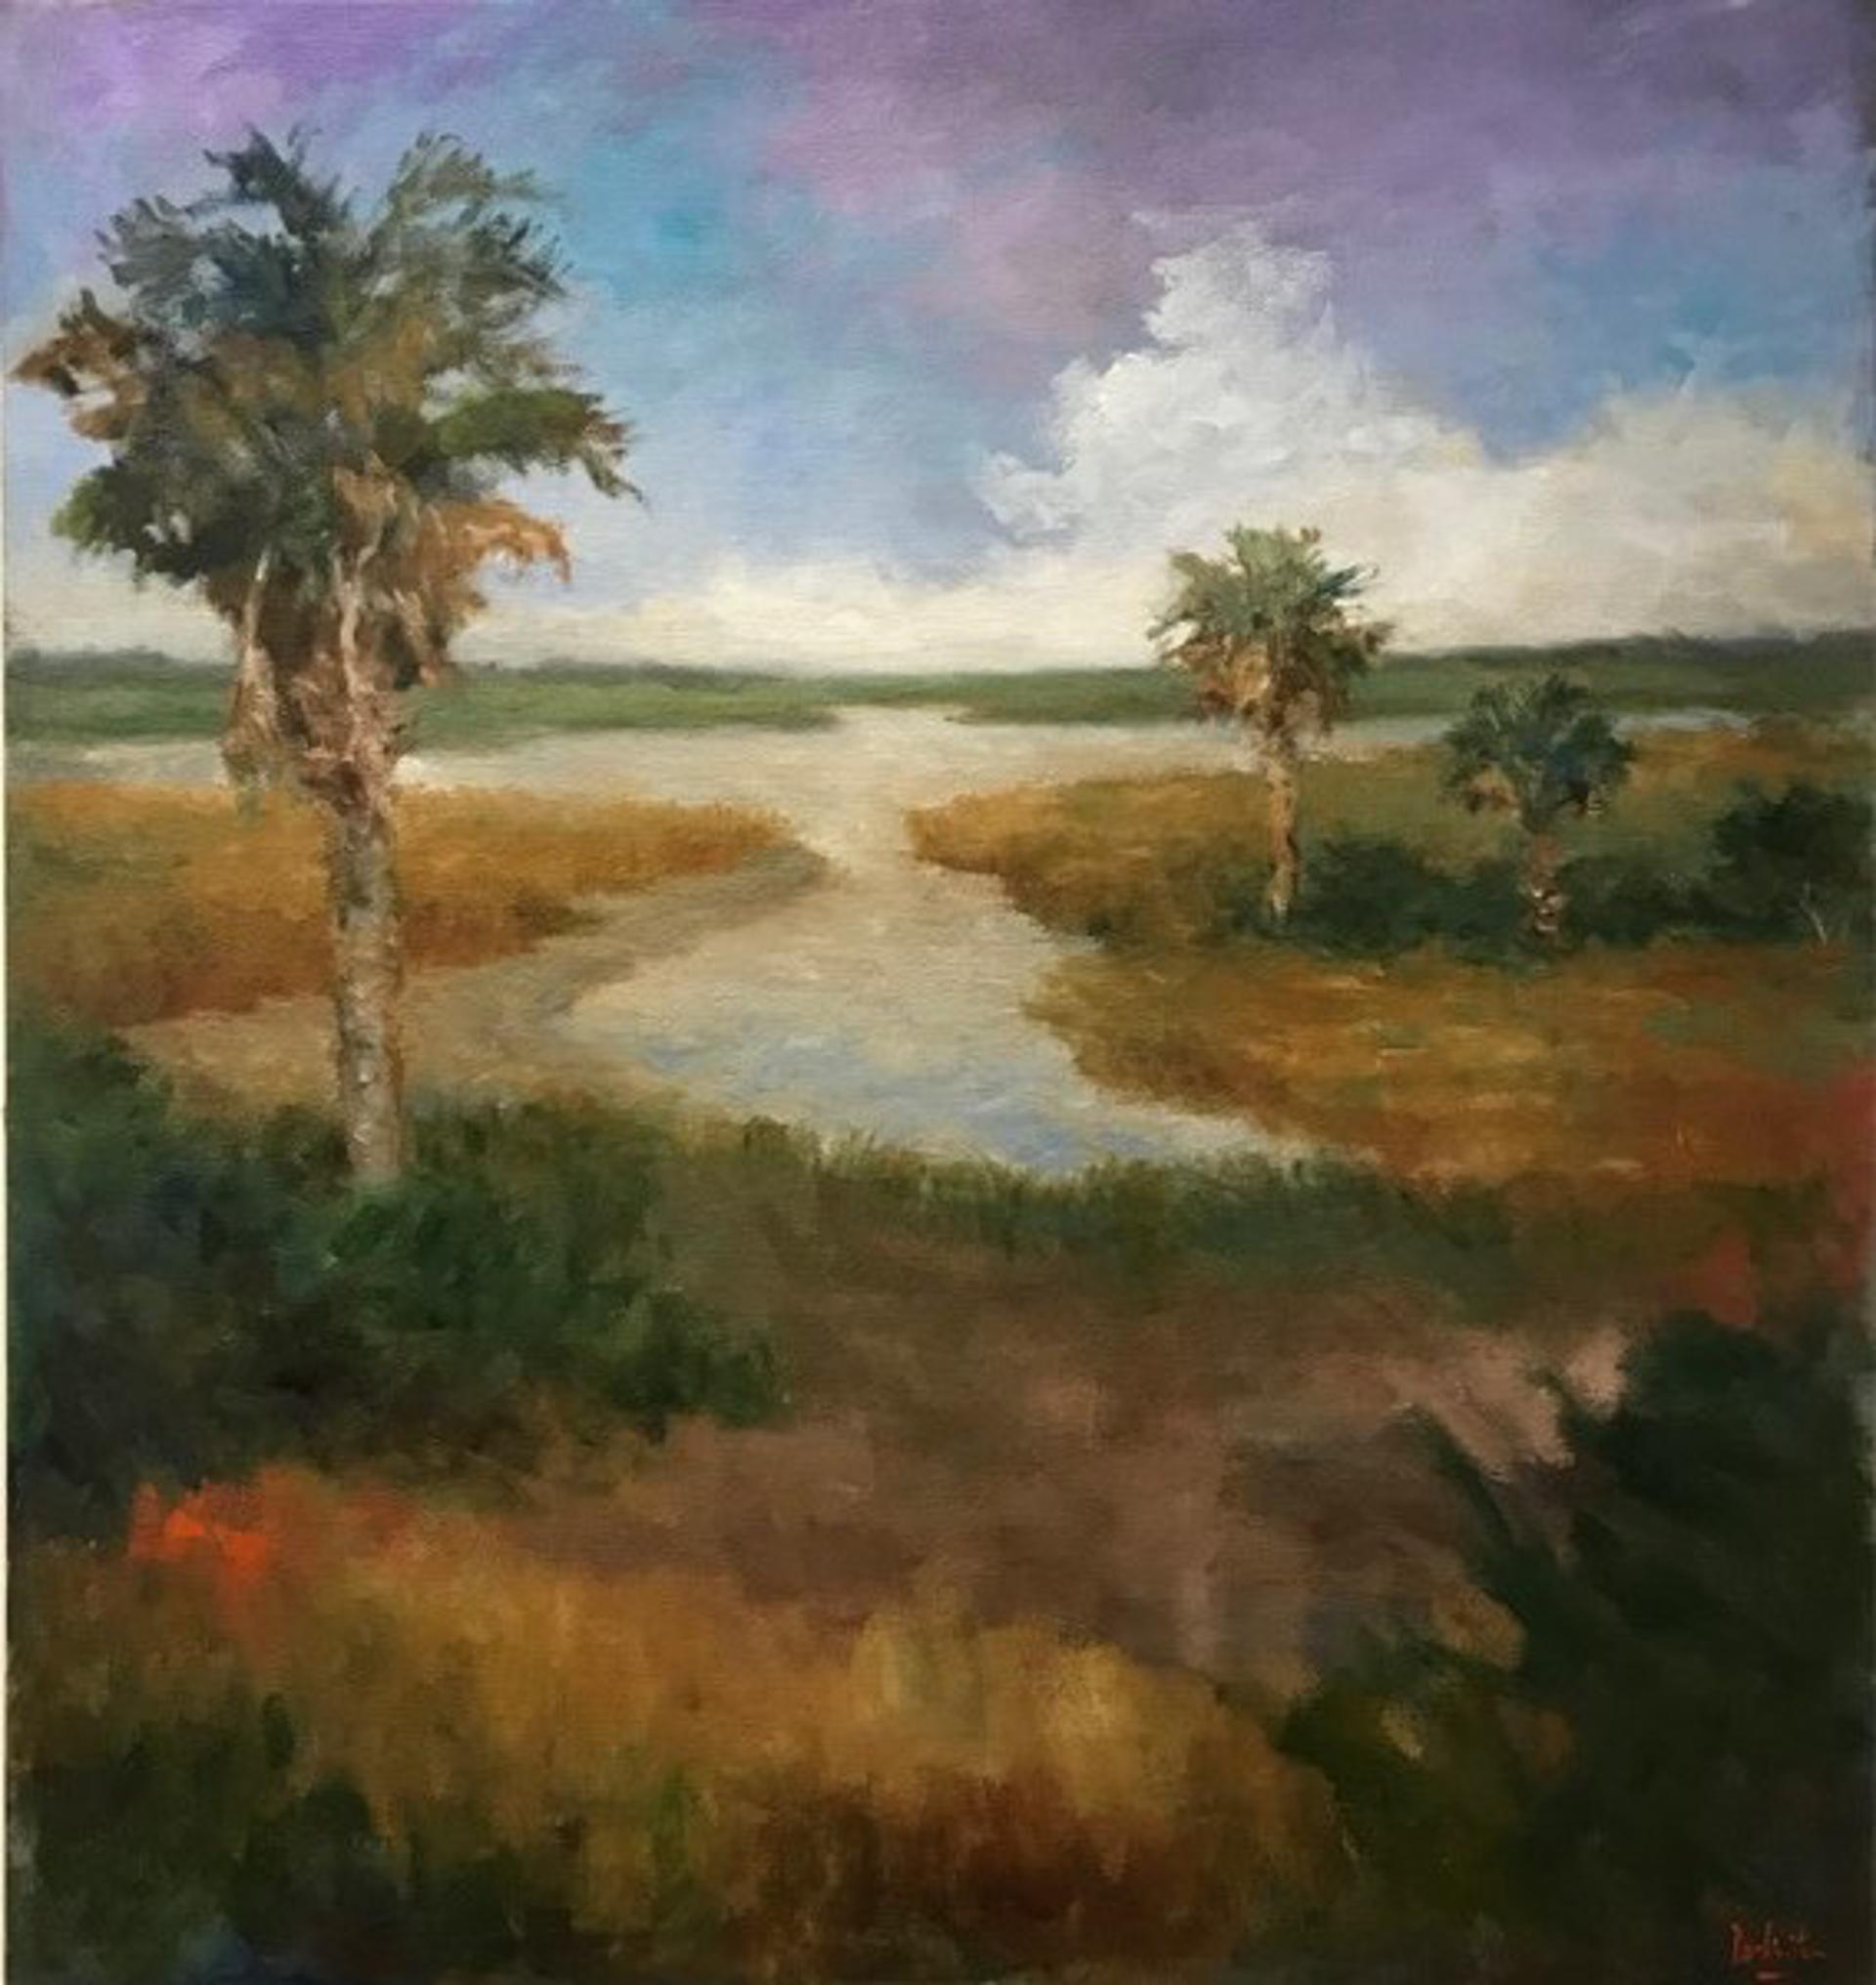 Winding Through Under Blue and Purple Sky by Jim Darlington